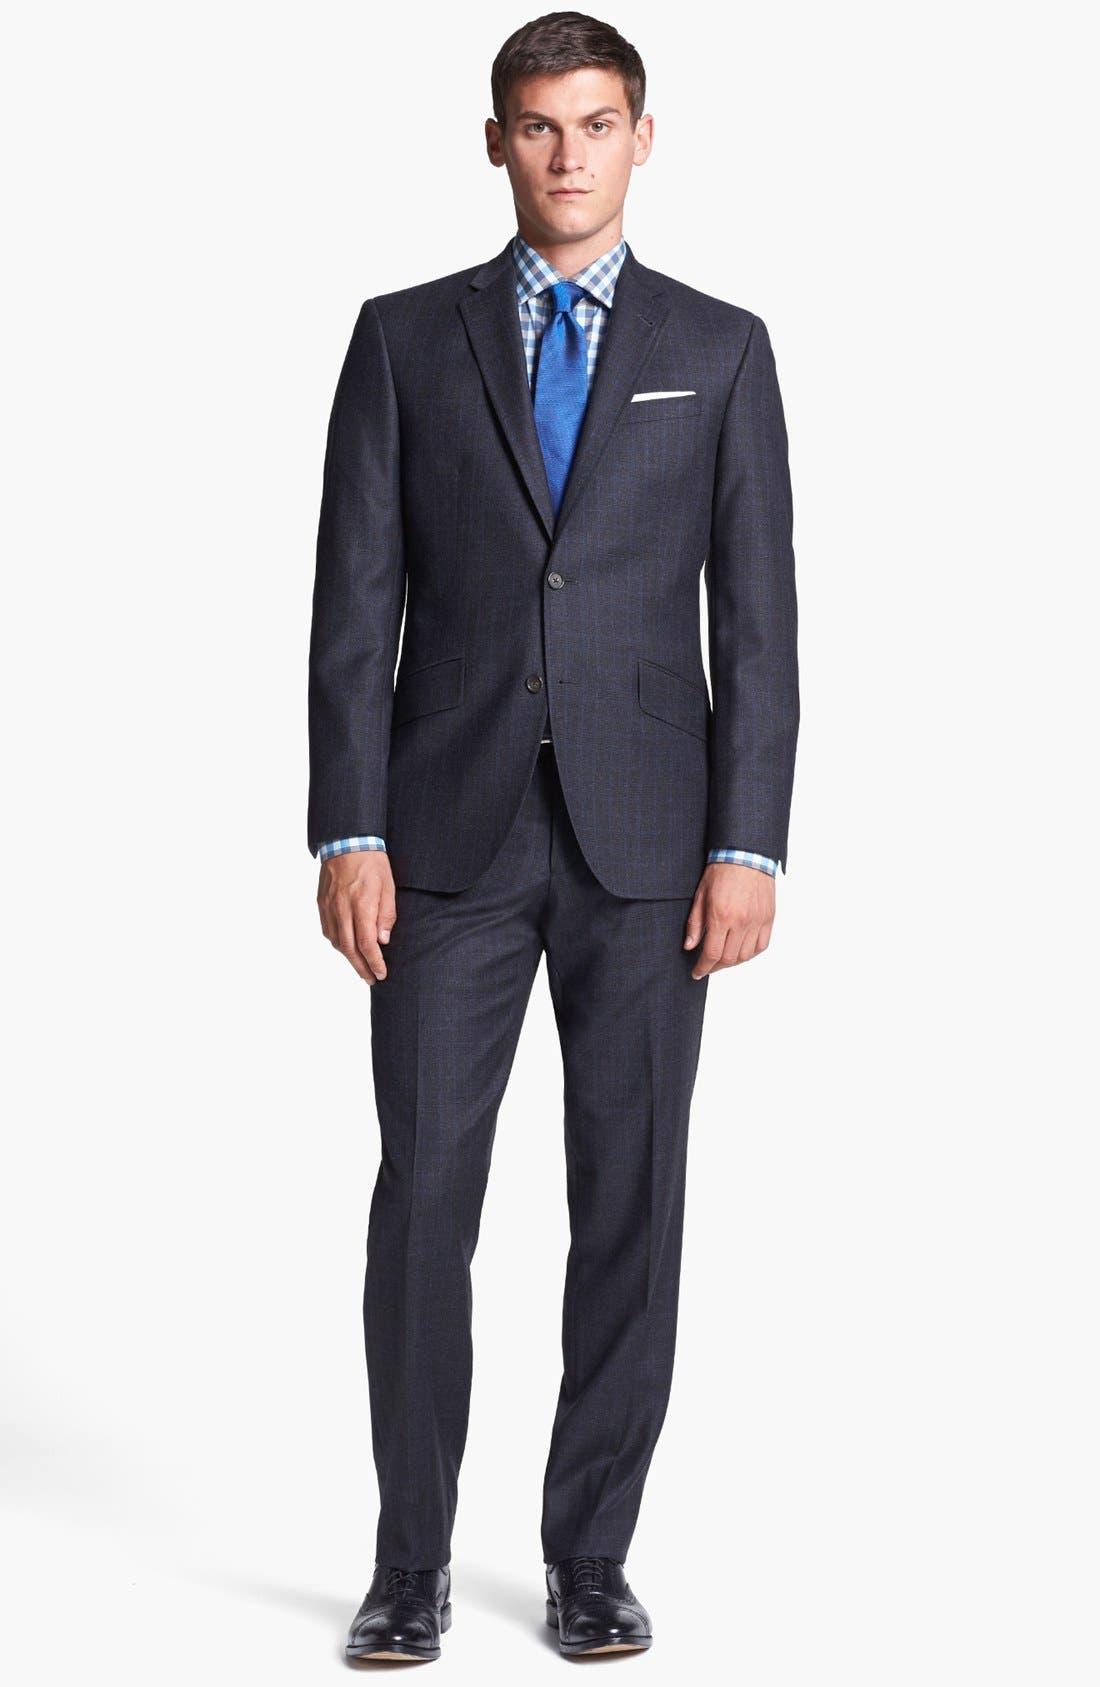 Alternate Image 1 Selected - Ted Baker London Suit & Calibrate Dress Shirt